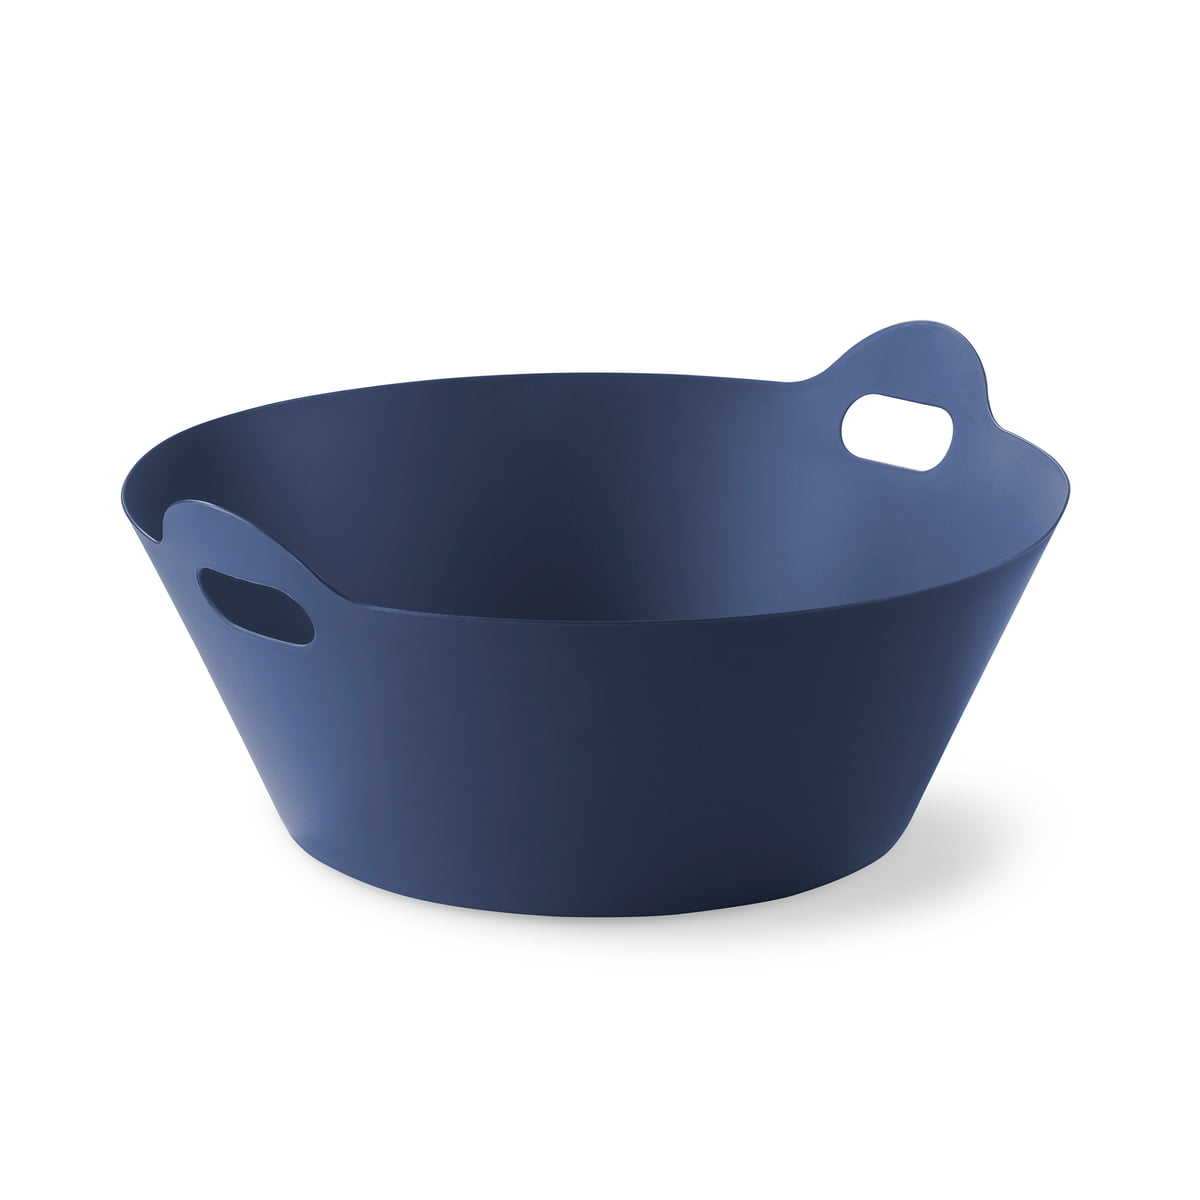 2Hands Kübel, blau